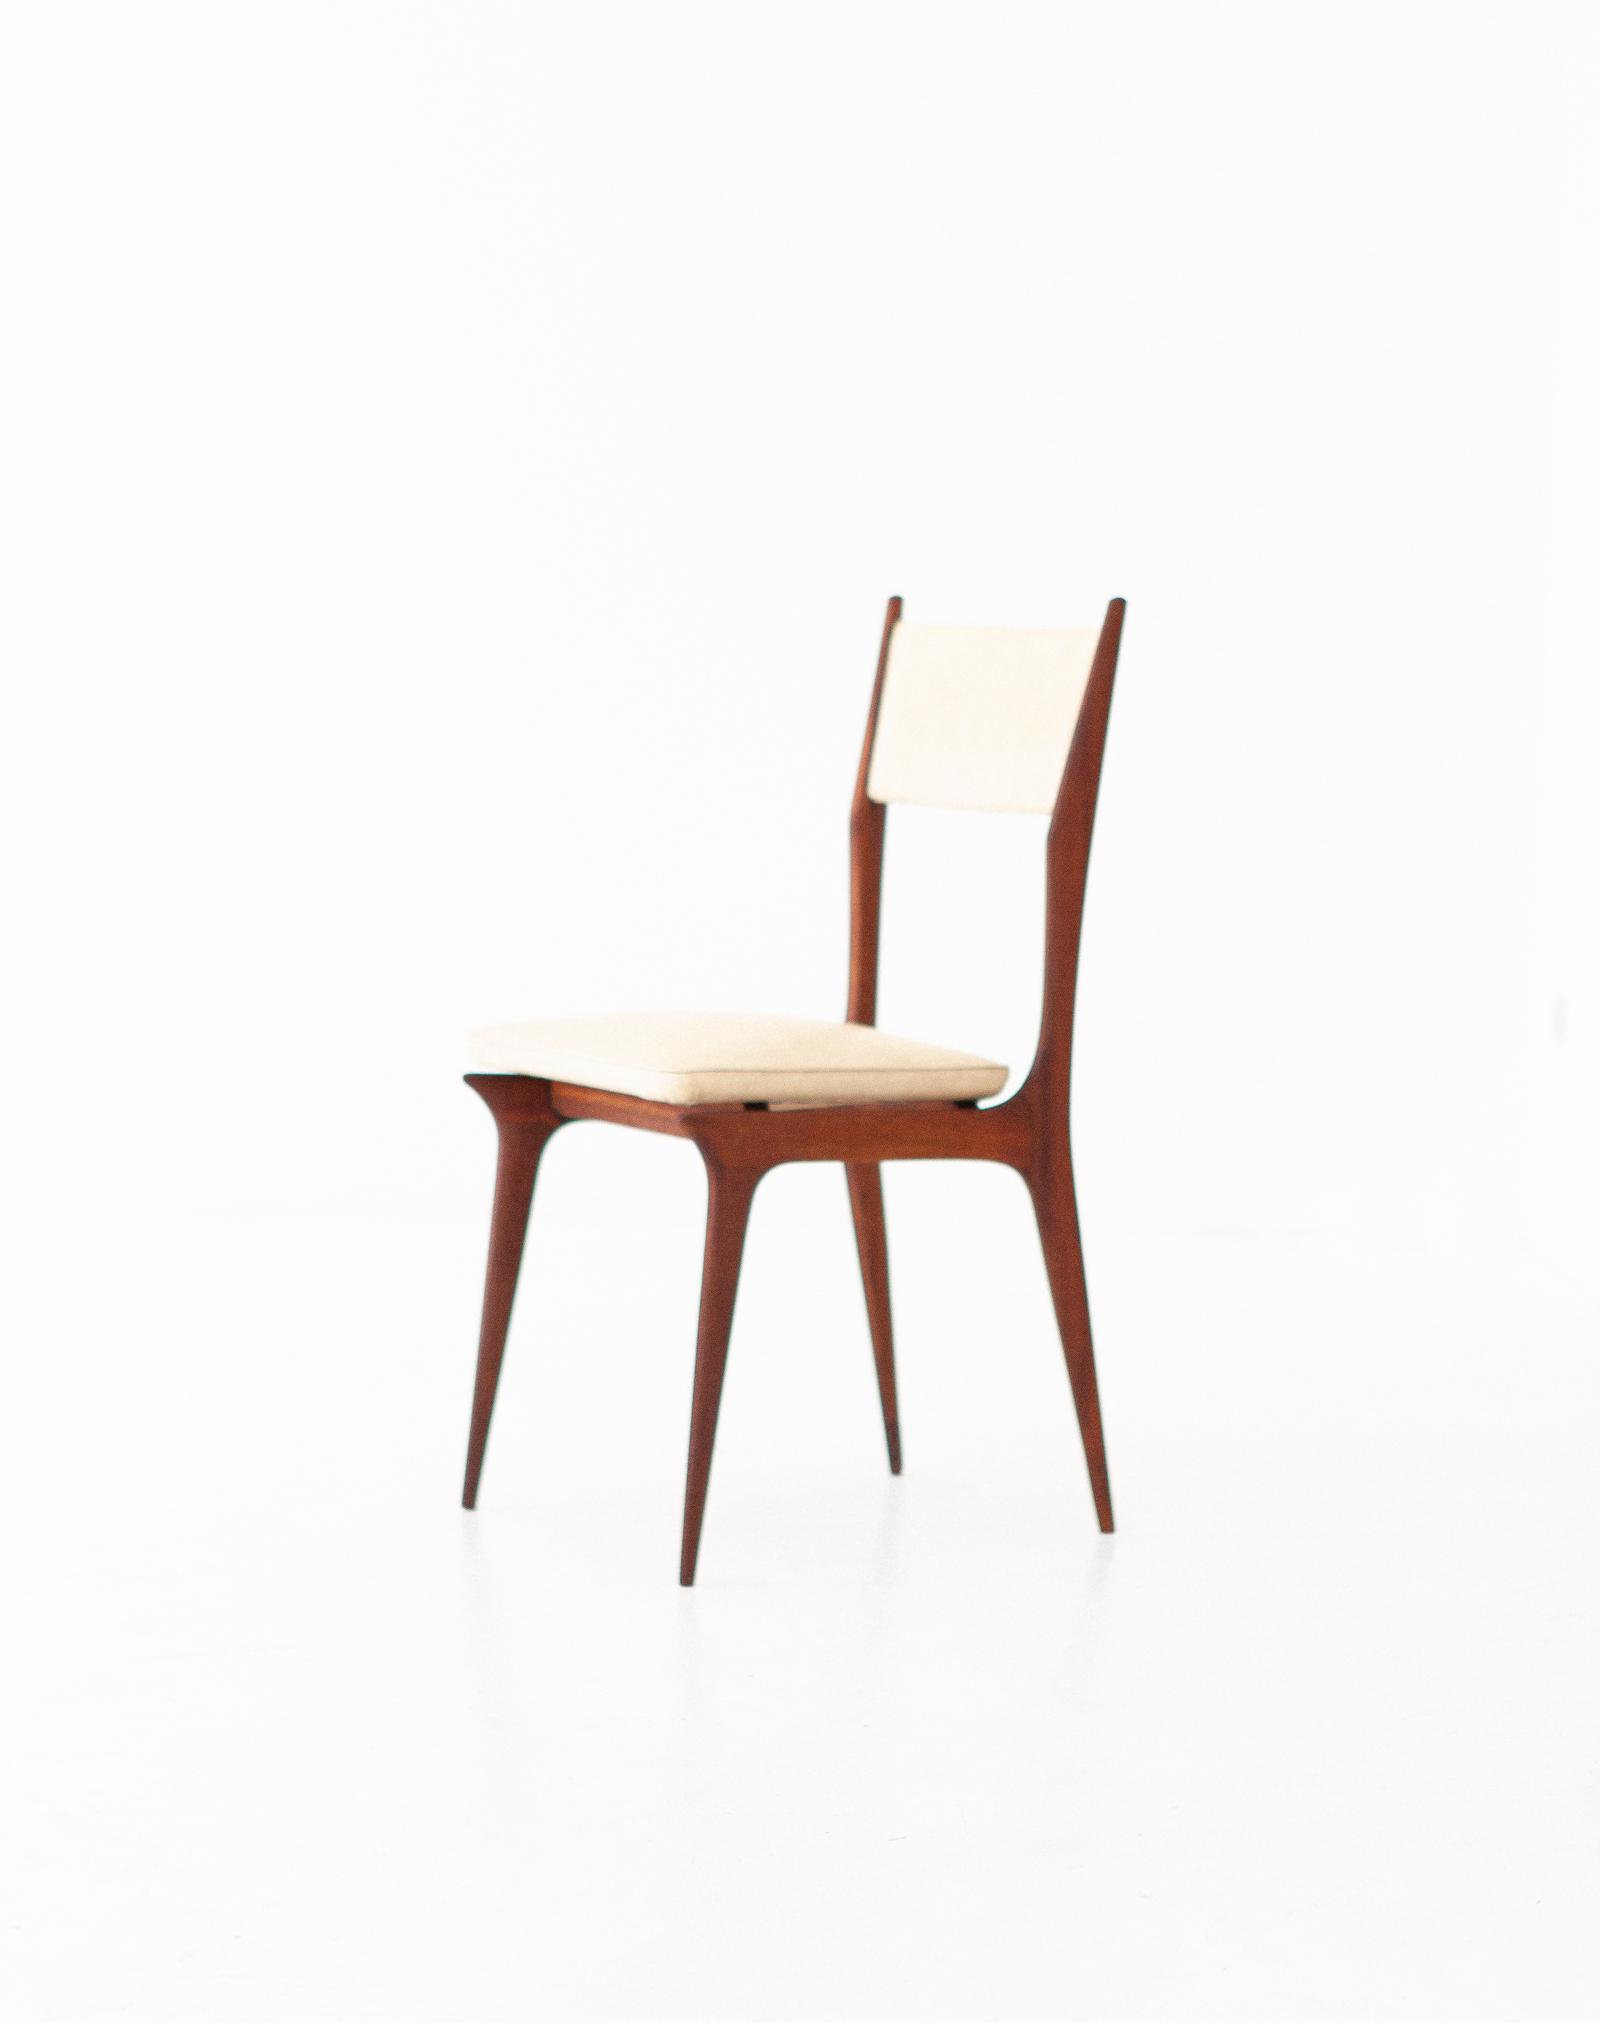 six-italian-mahogany-beige-skai-dining-chairs-3-SE281